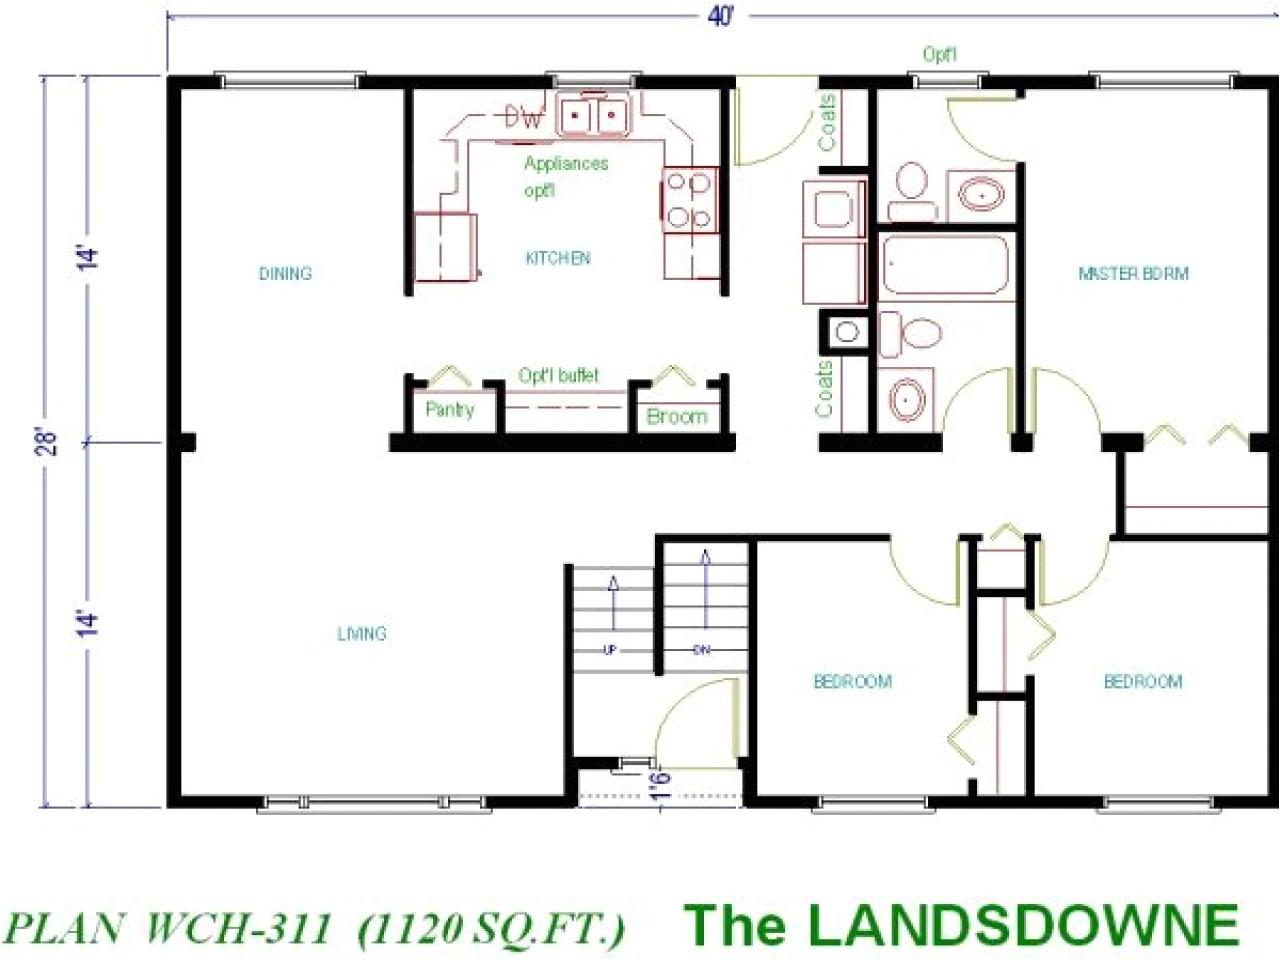 41f2c876b576b6d4 house plans under 1000 sq ft house plans under 1000 square feet